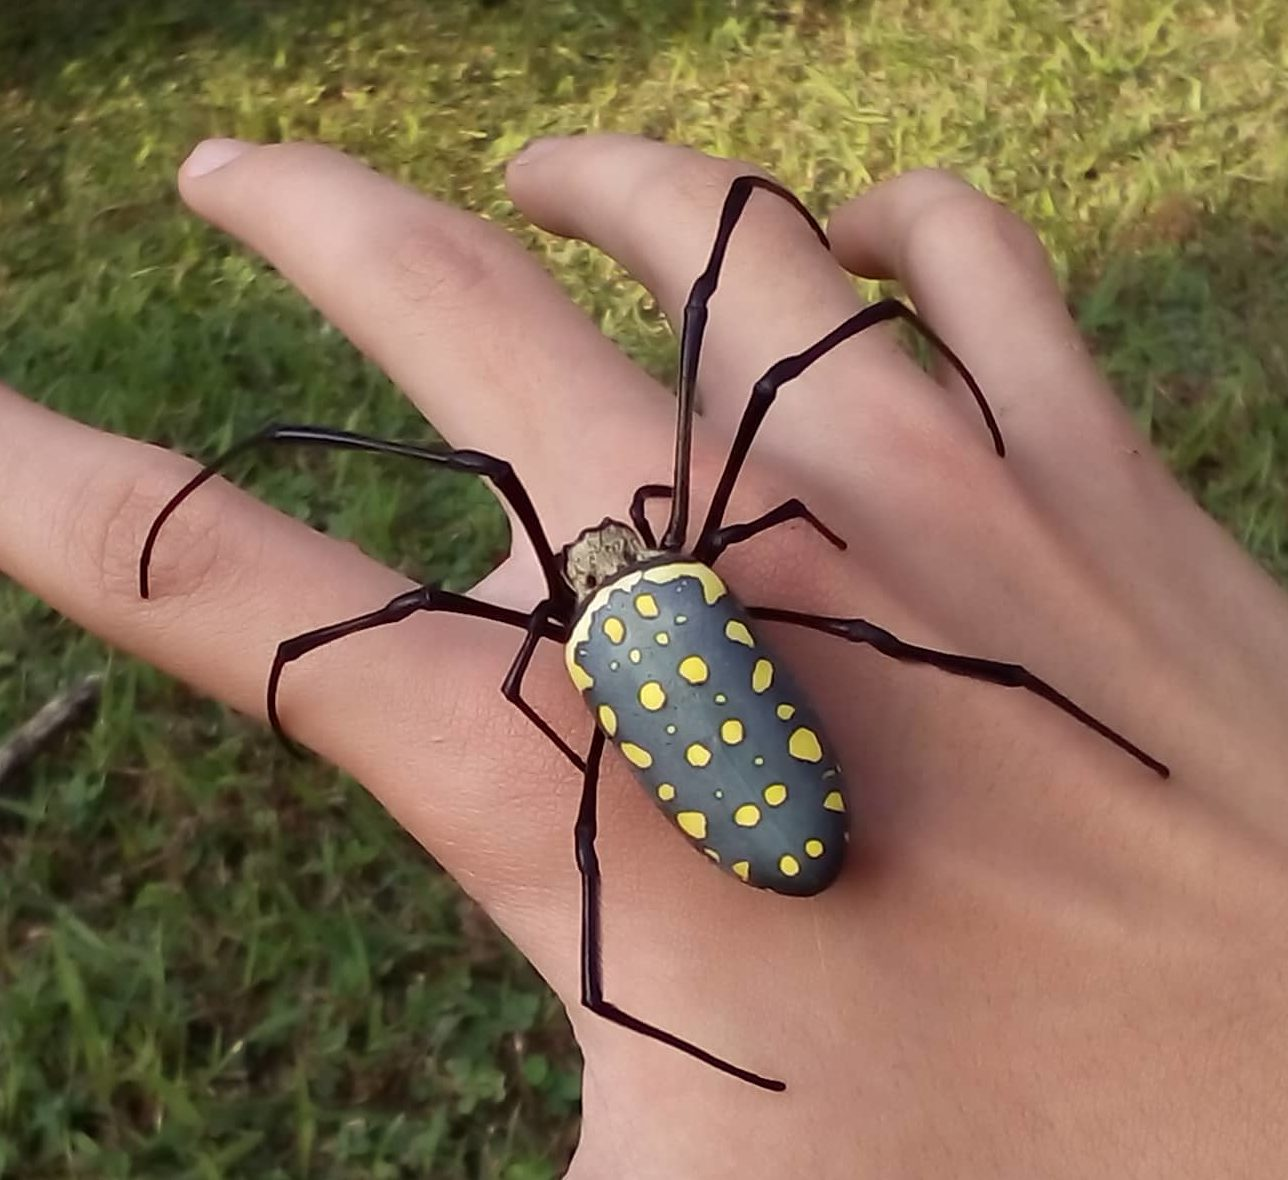 Picture of Trichonephila antipodiana (Batik Golden Web Spider) - Female - Dorsal